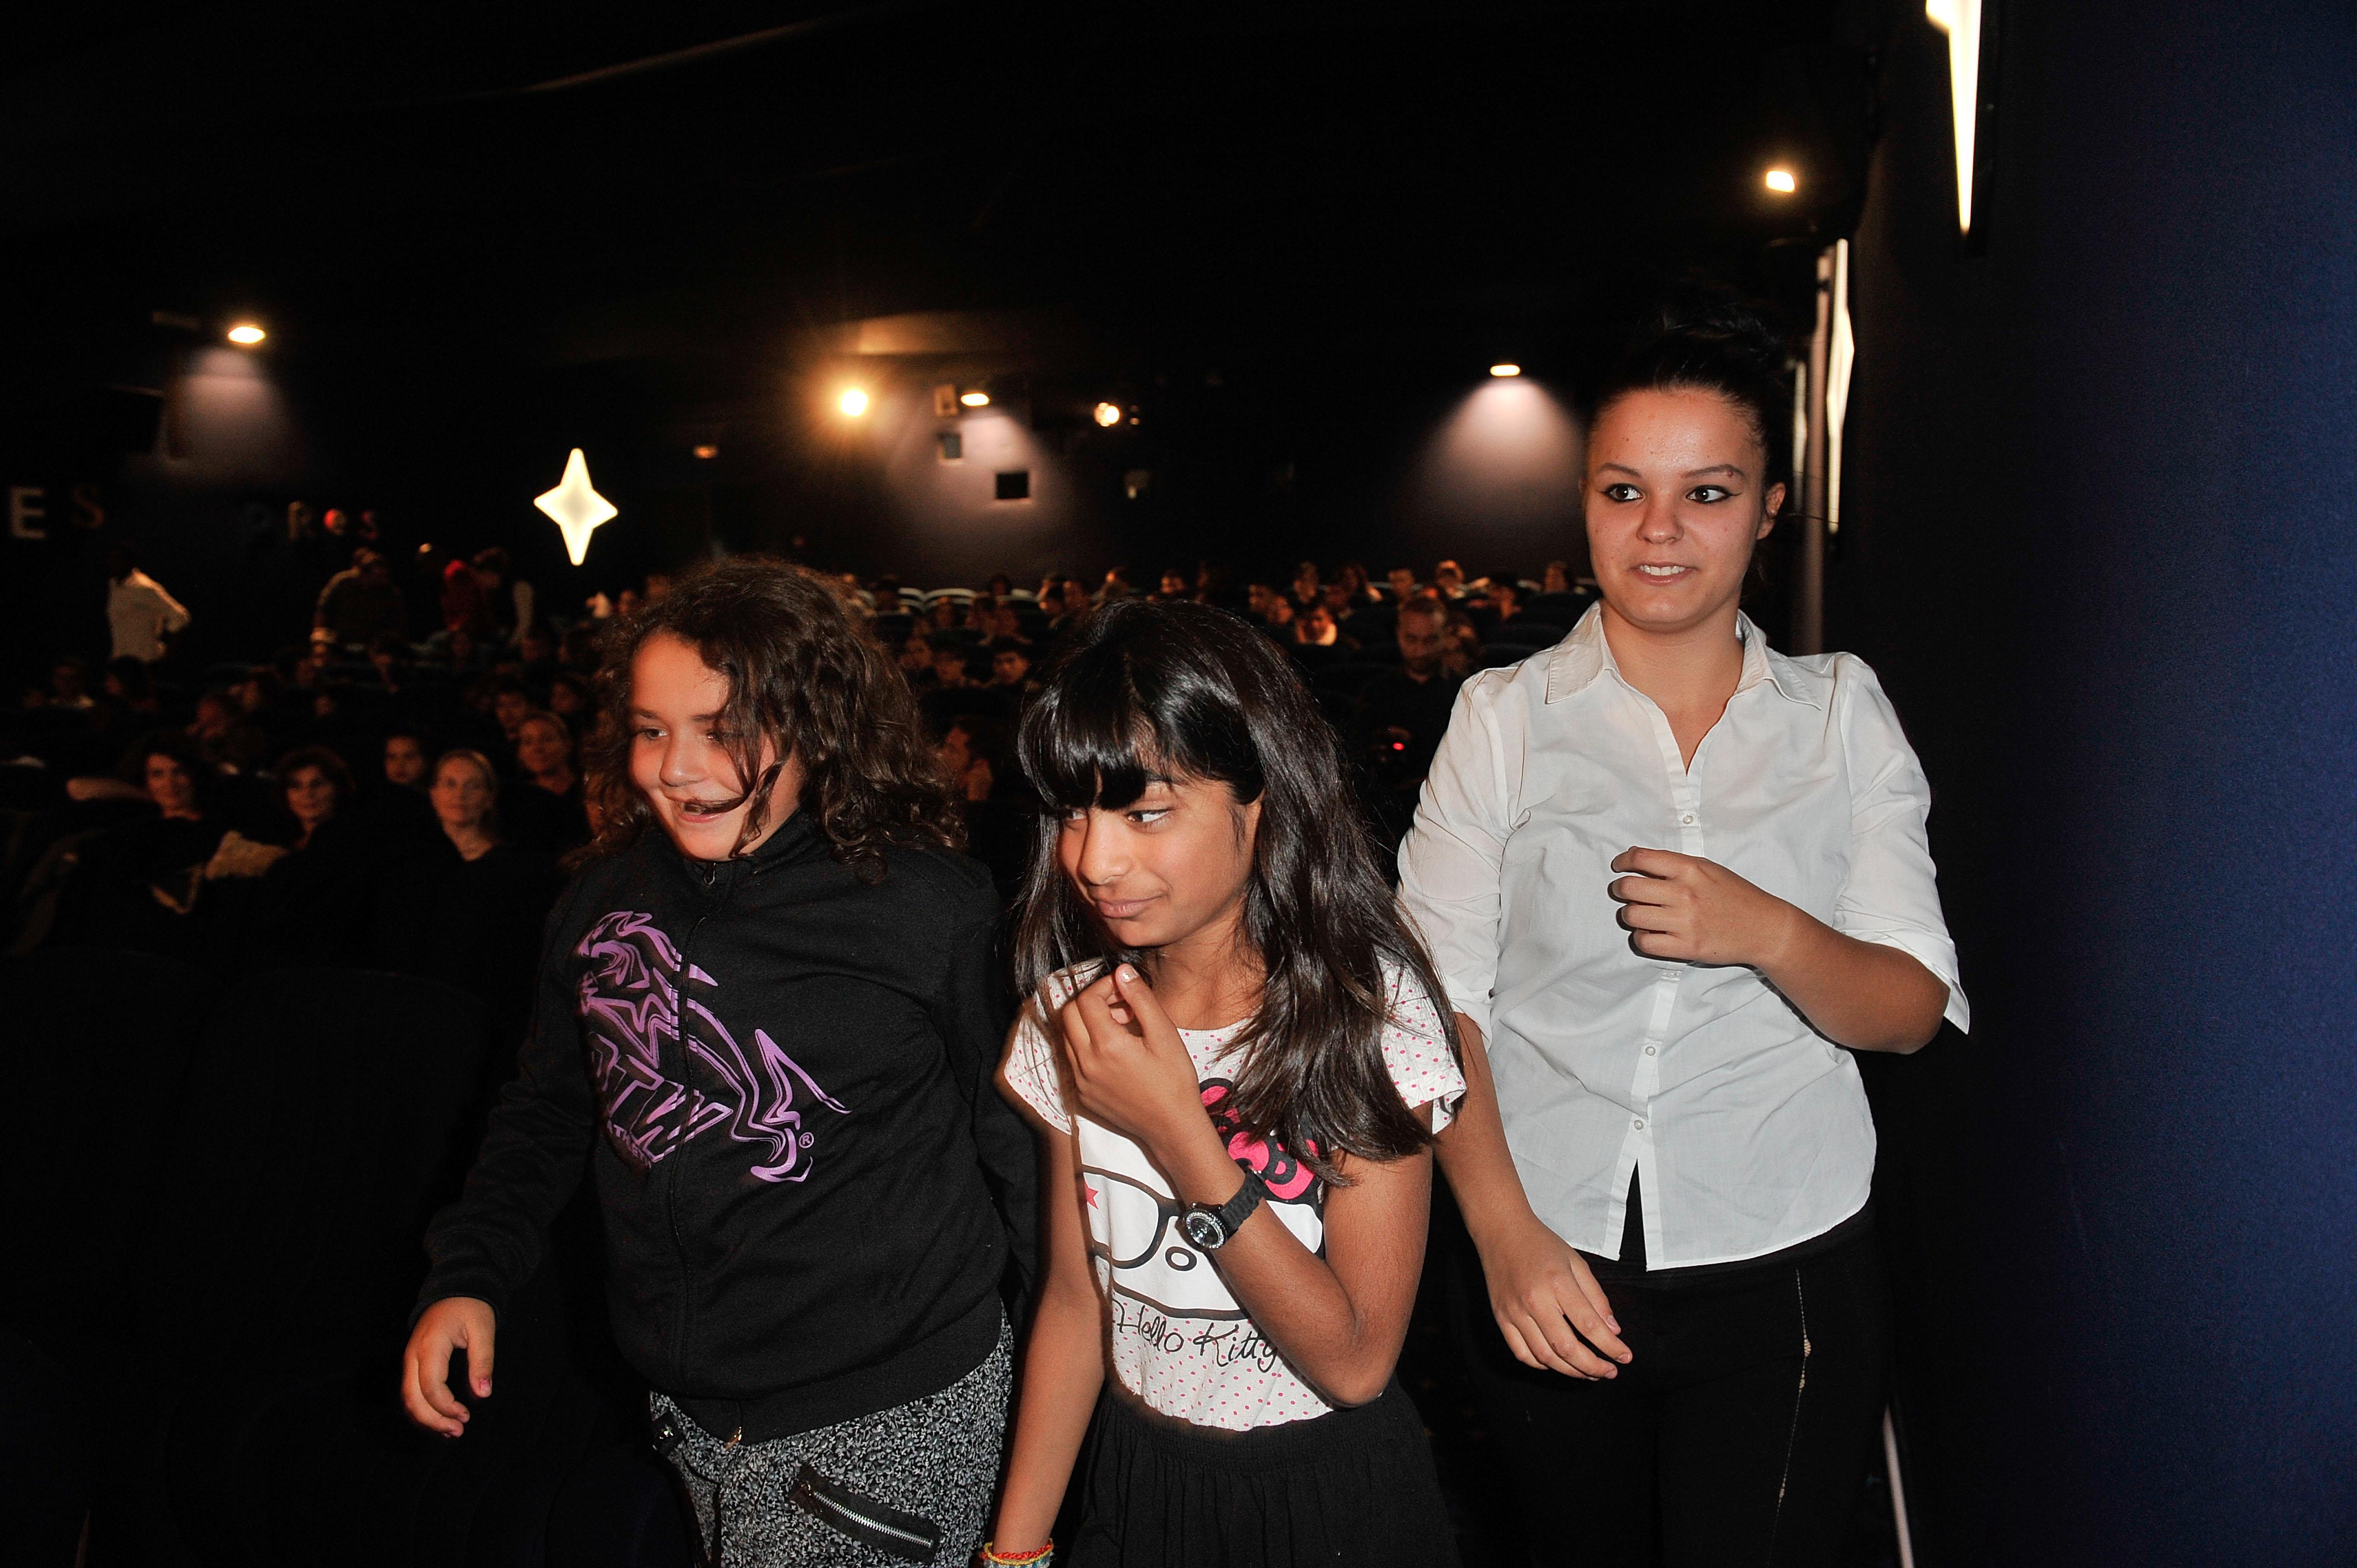 SOS_festival_saint-germain